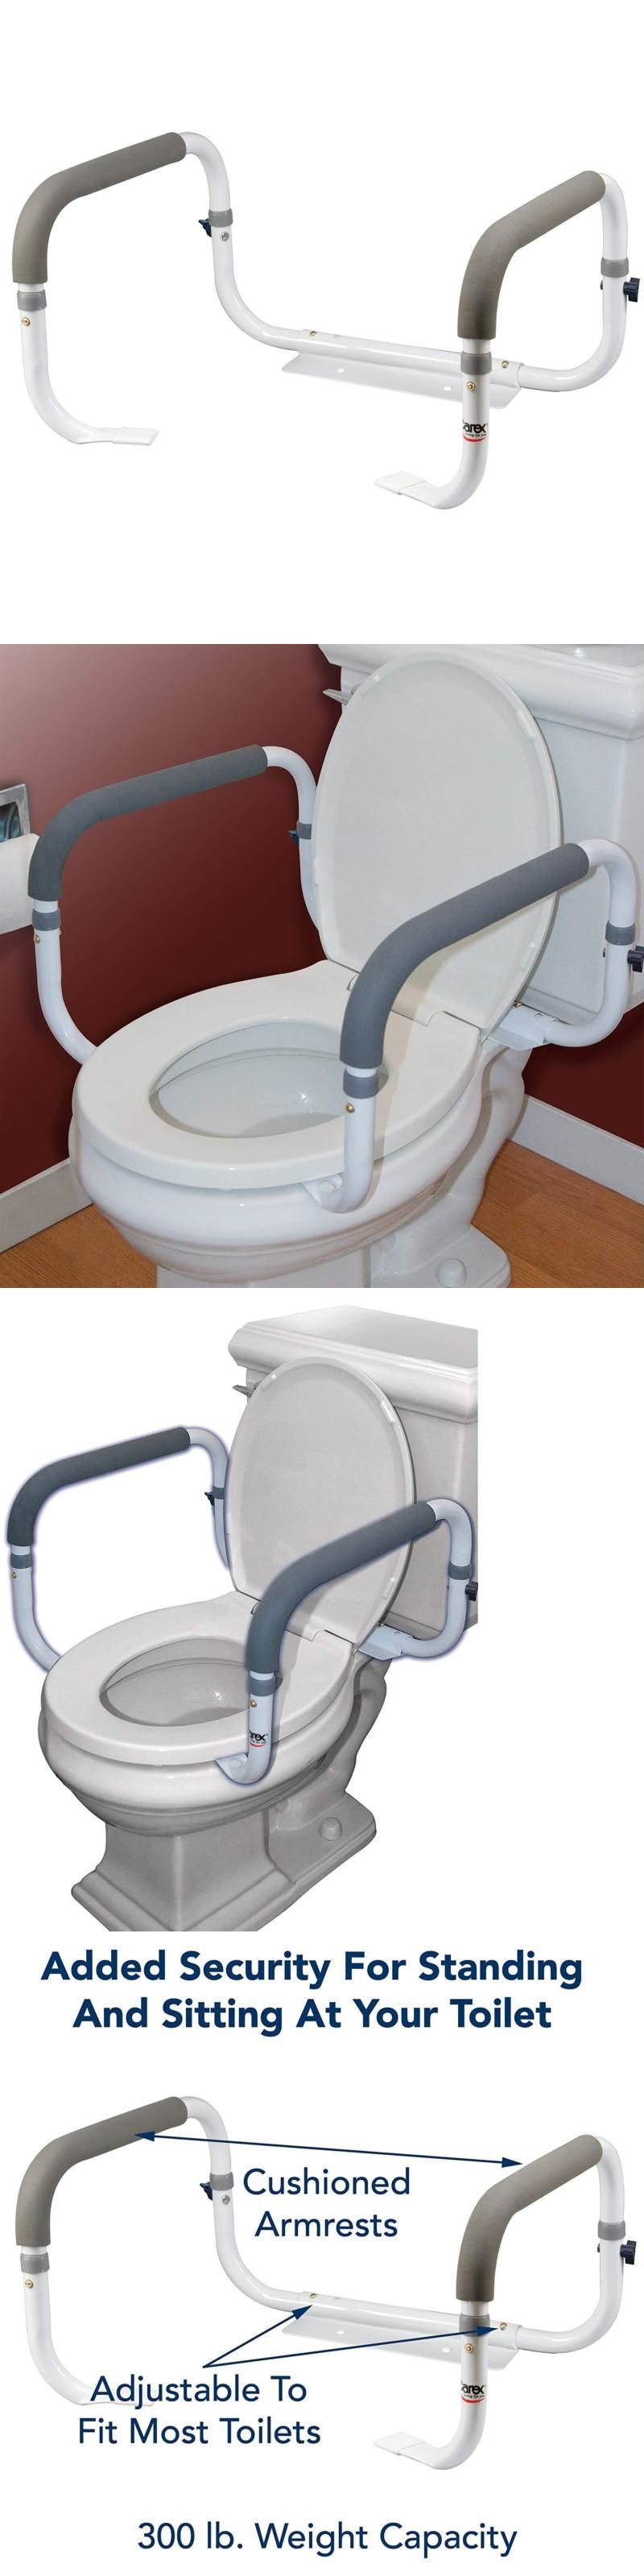 Toilet safety frame rail bathroom grab bars seat medical support